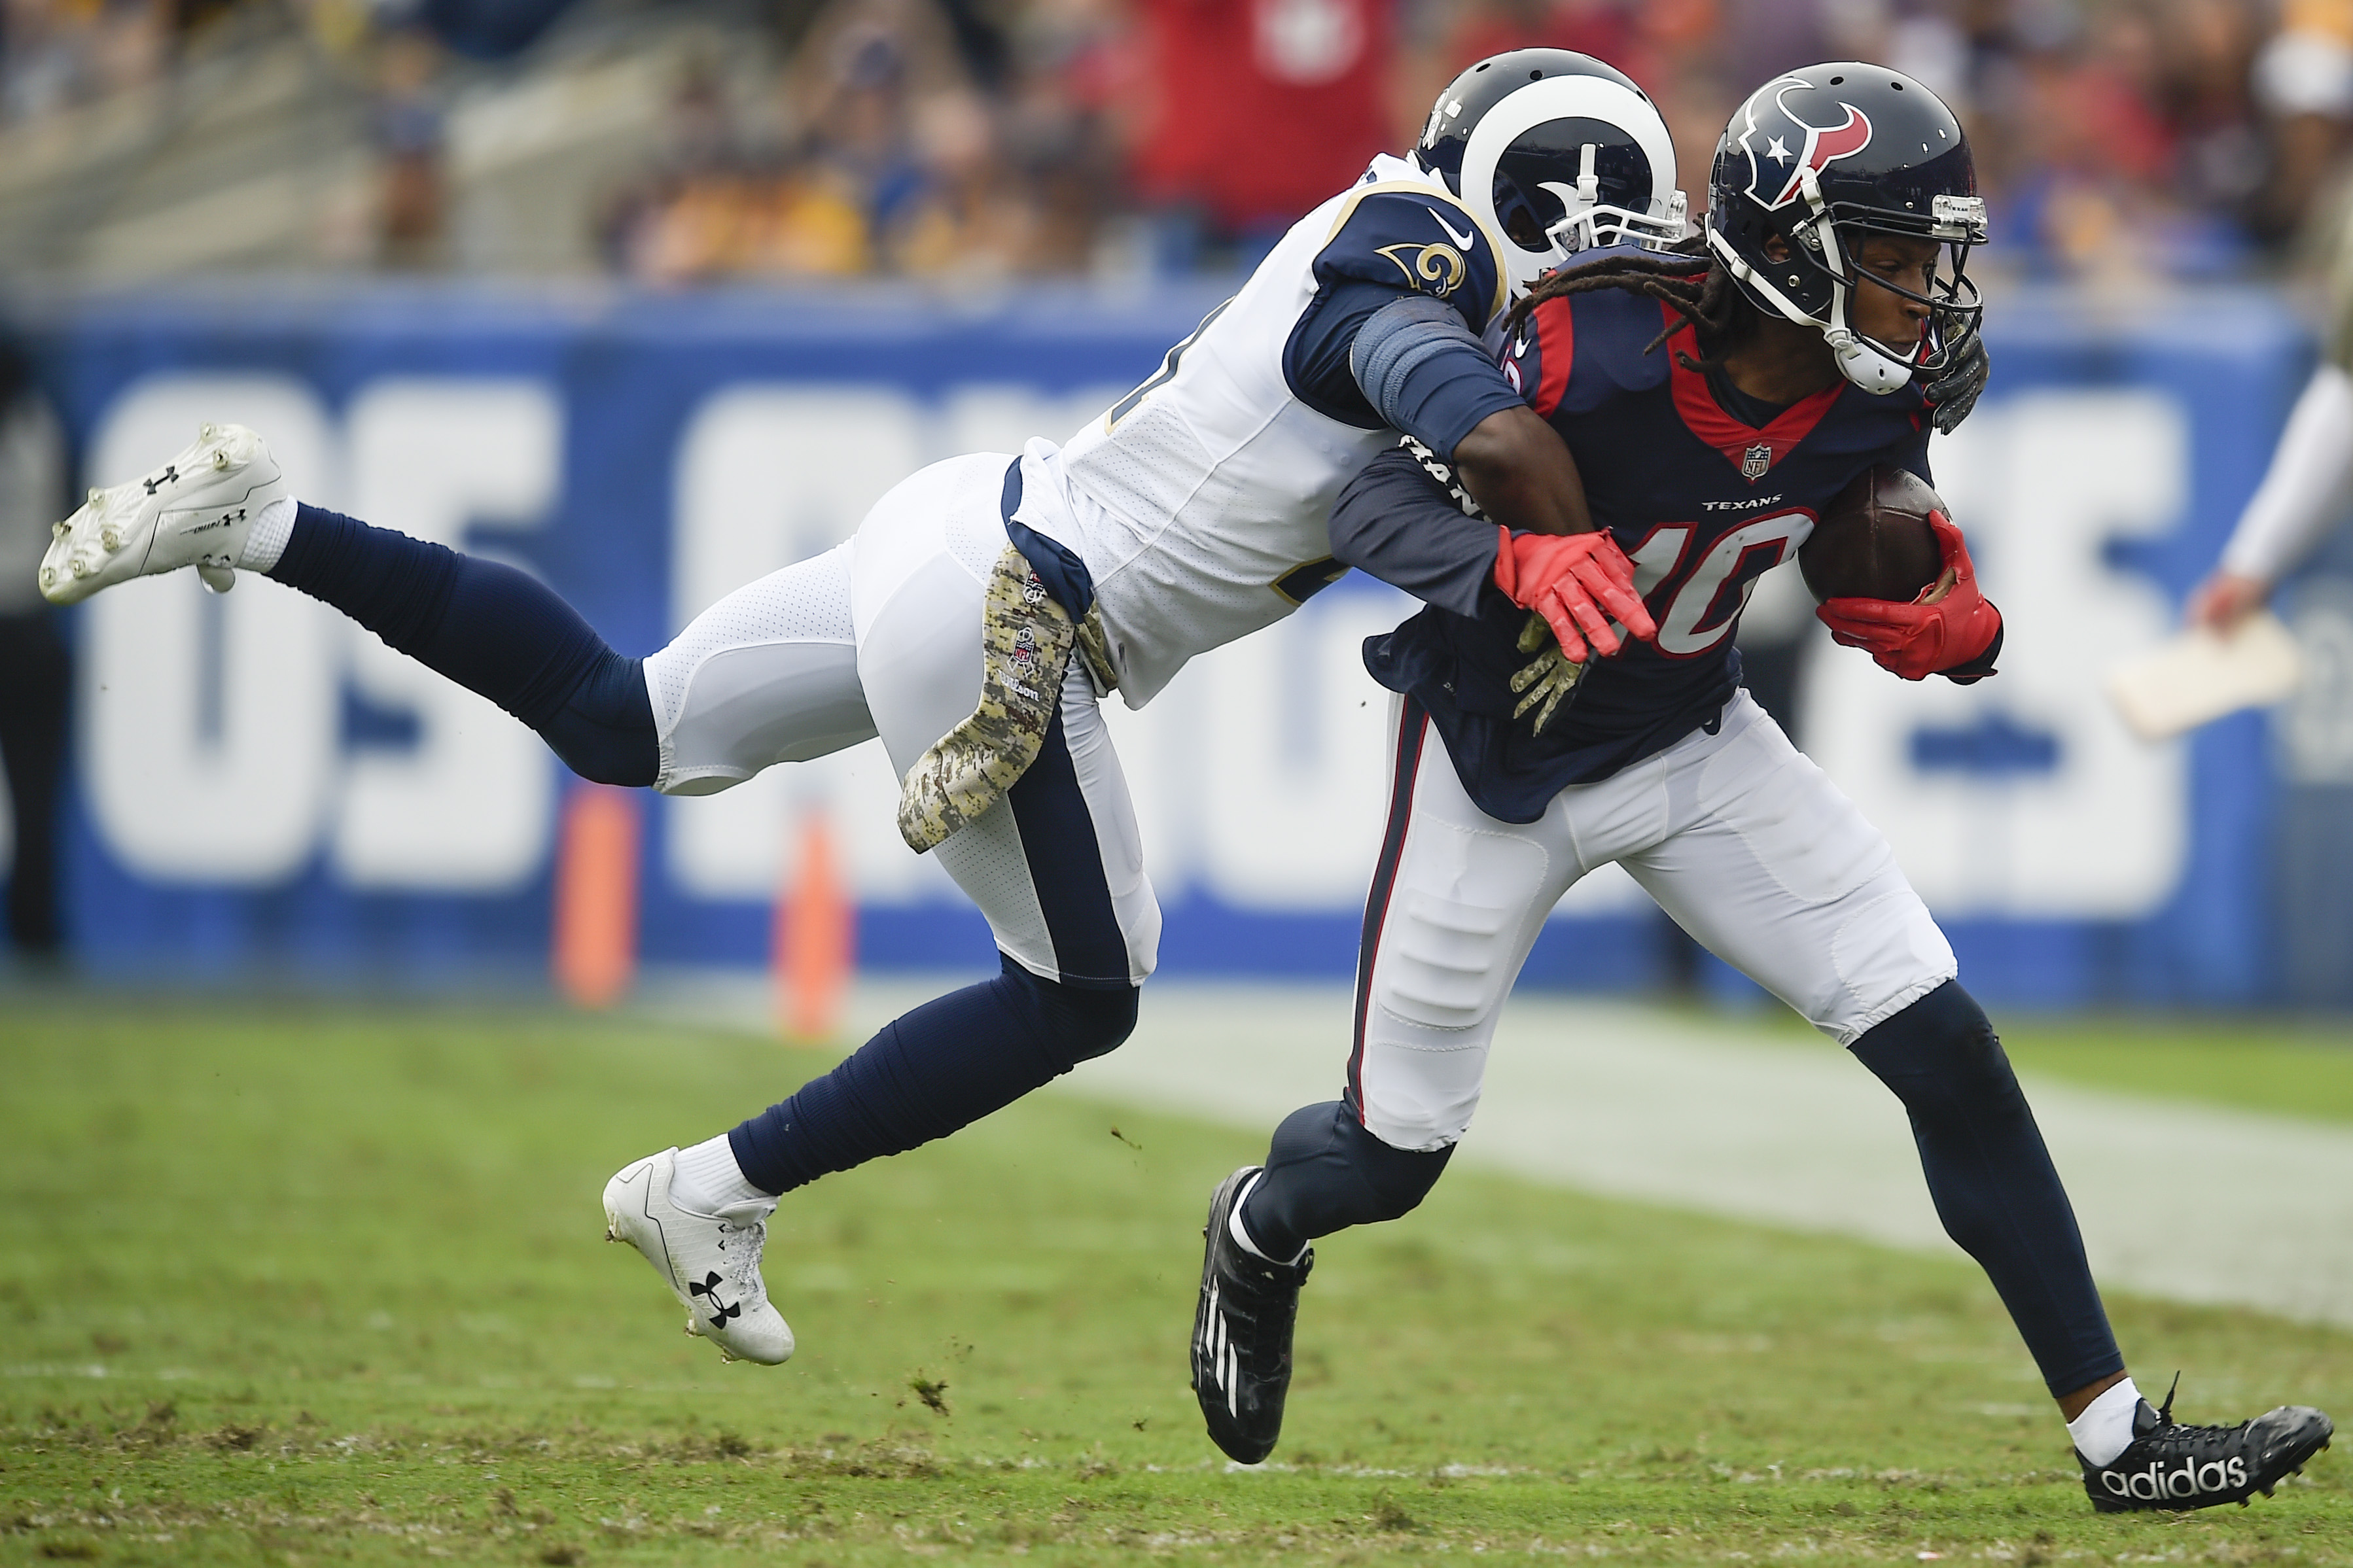 Los Angeles Rams CB Kayvon Webster tackles Houston Texans WR DeAndre Hopkins in Week 10, November 12, 2017.